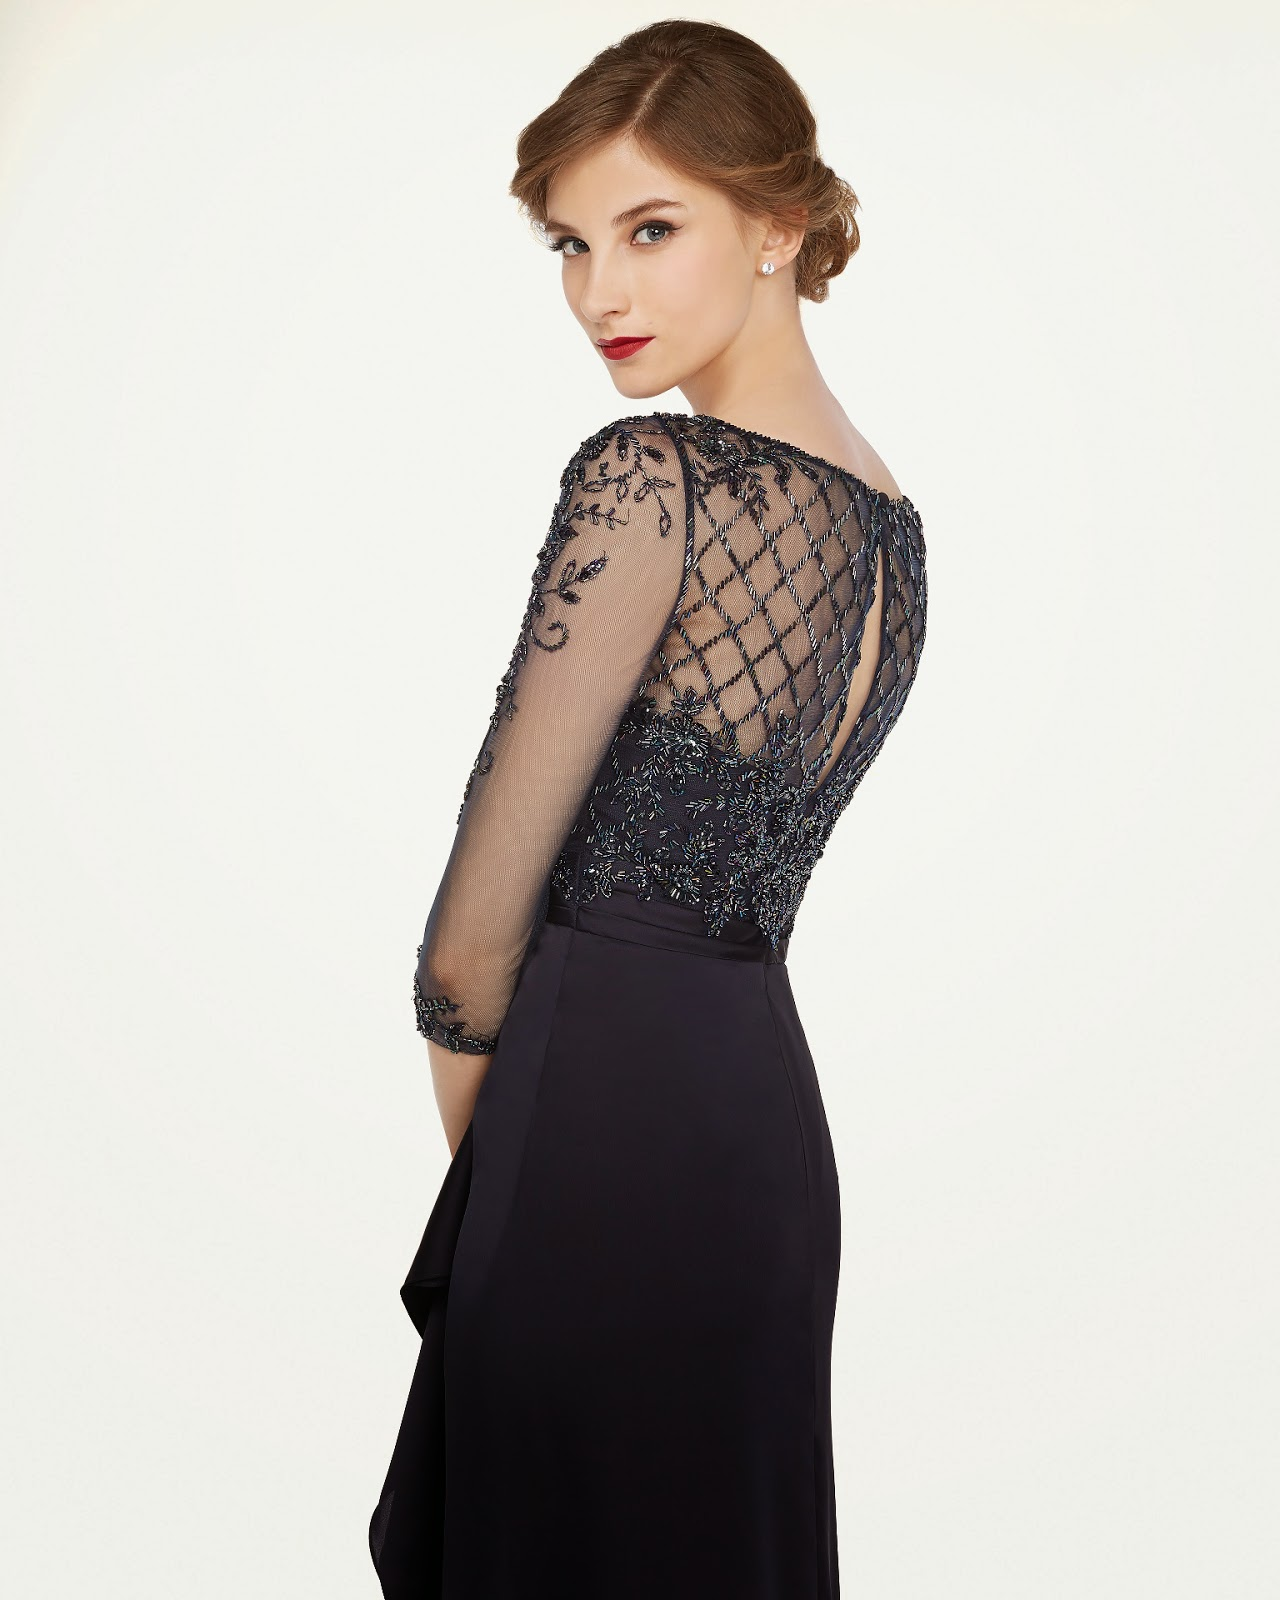 d0e8e7e7a Un año mas la nueva colección de vestidos de fiesta